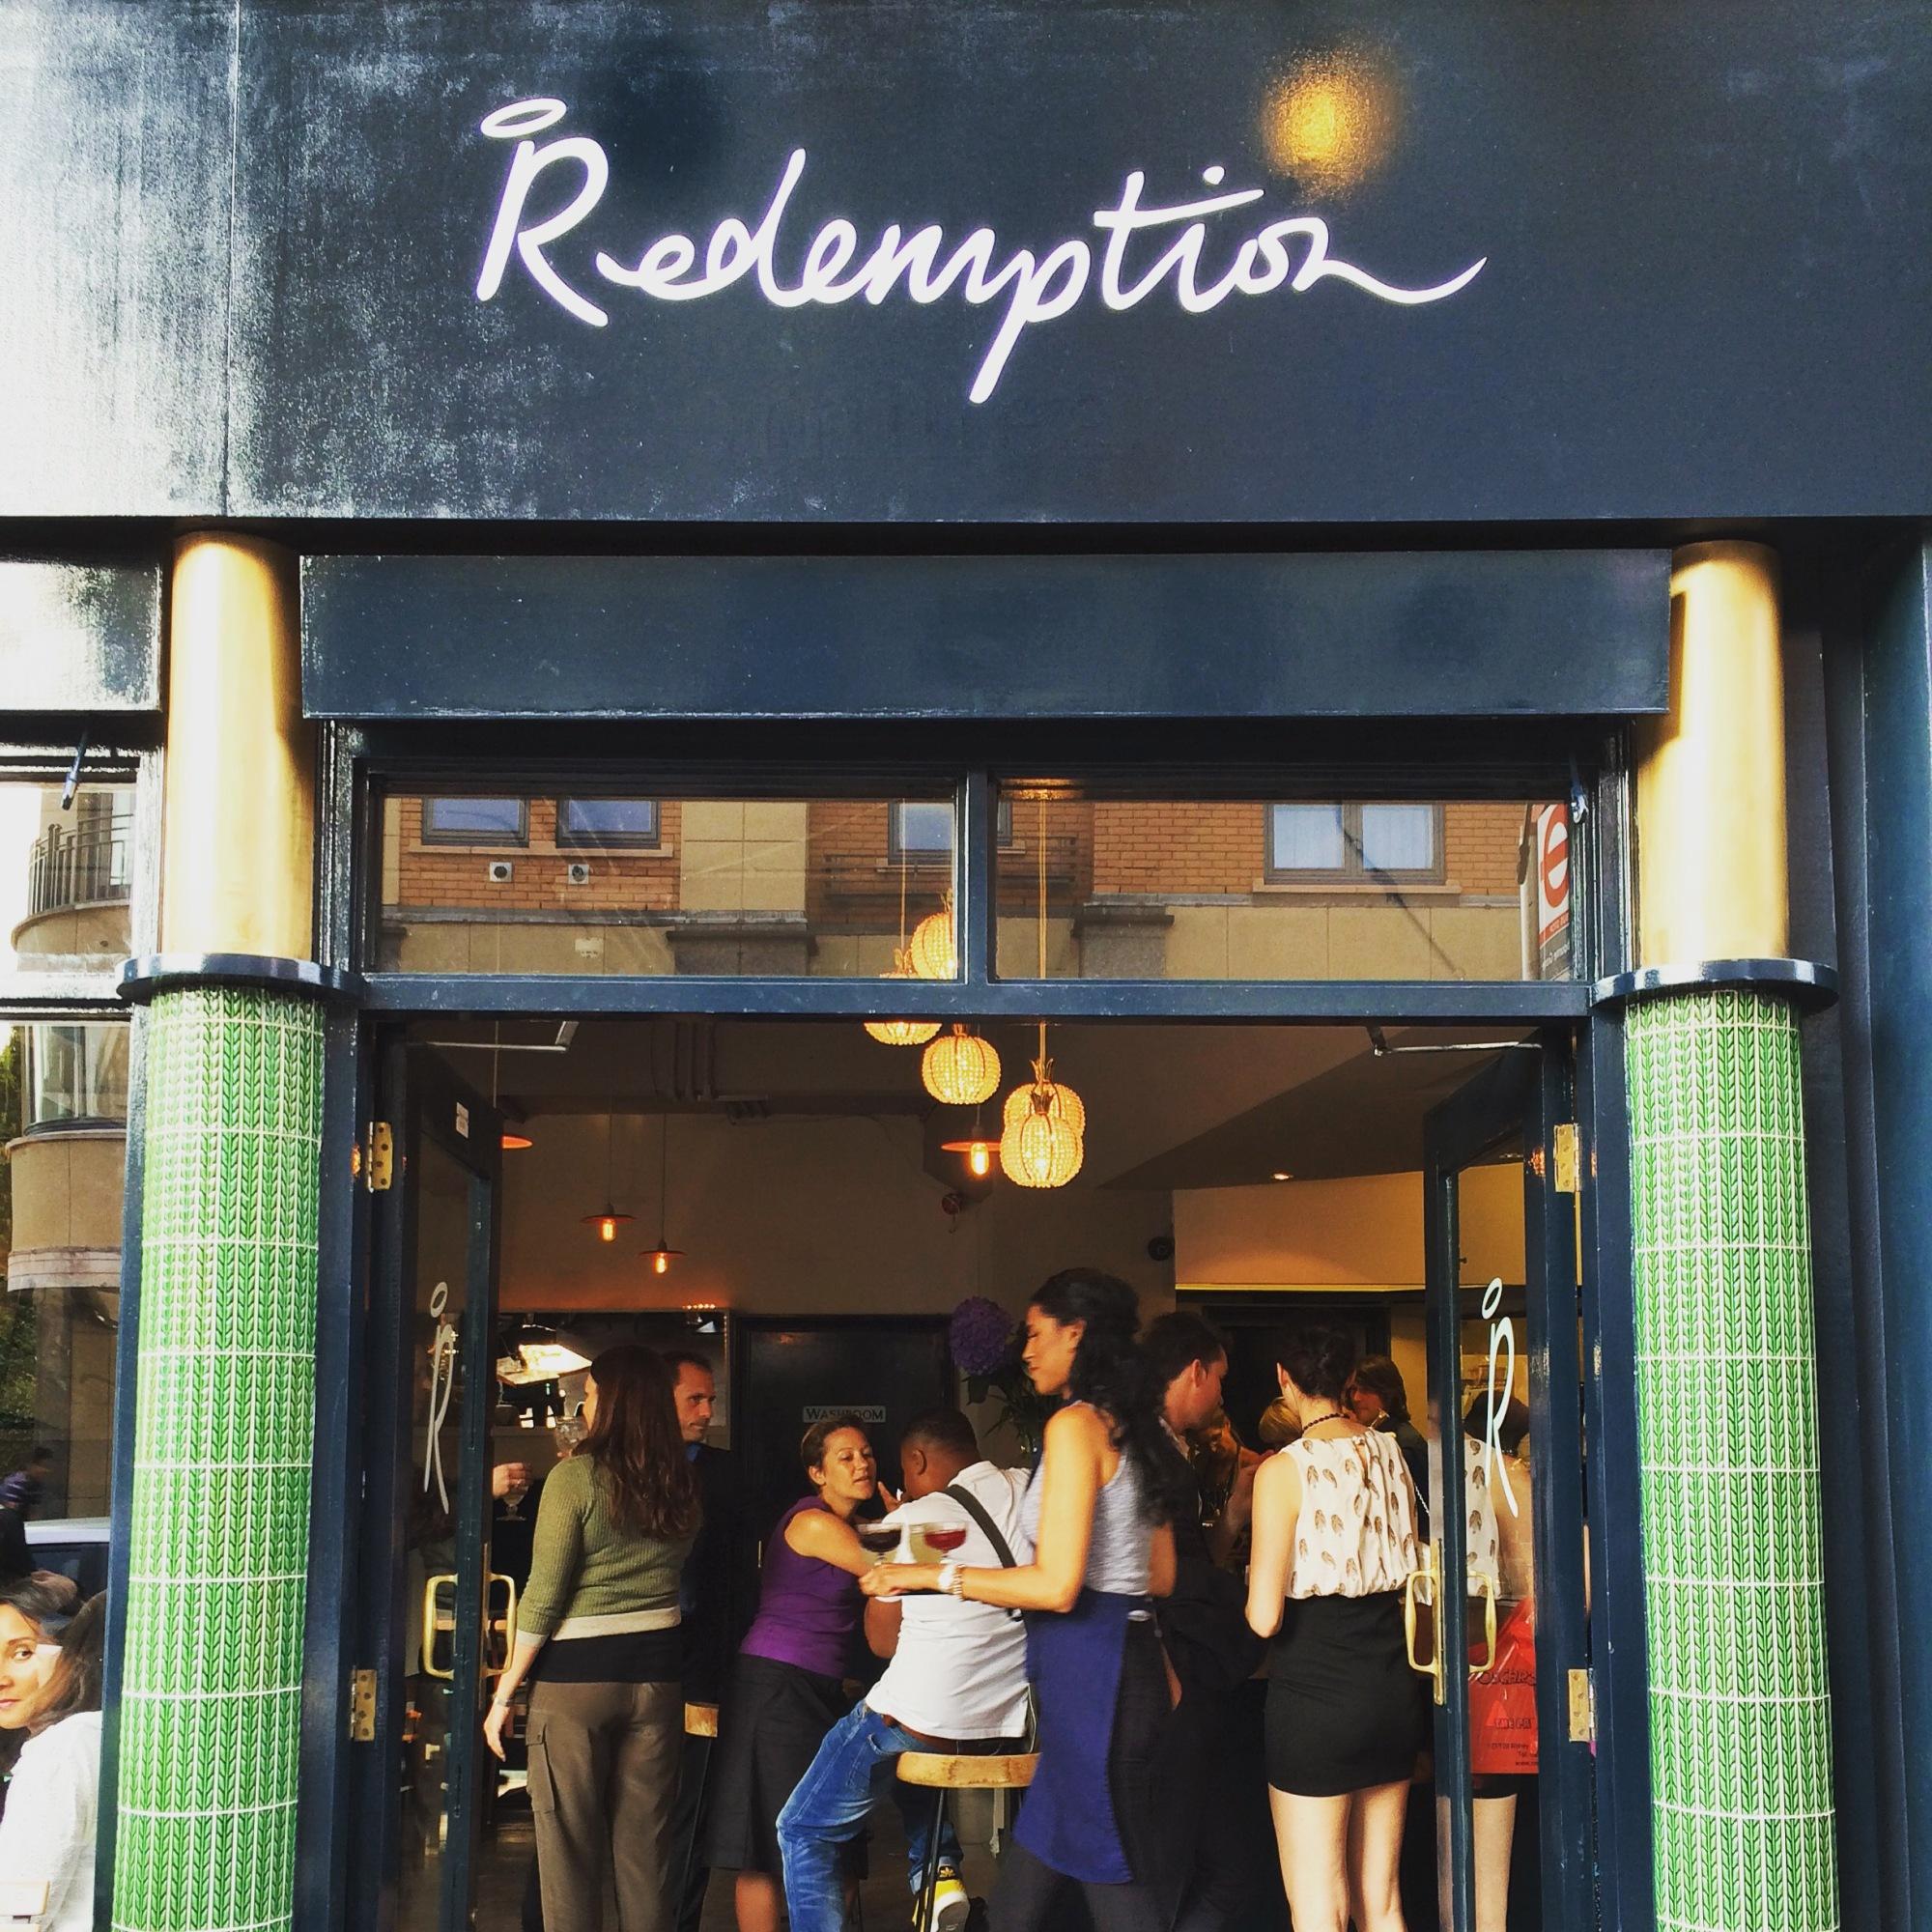 redemption restaurant bar notting hill london